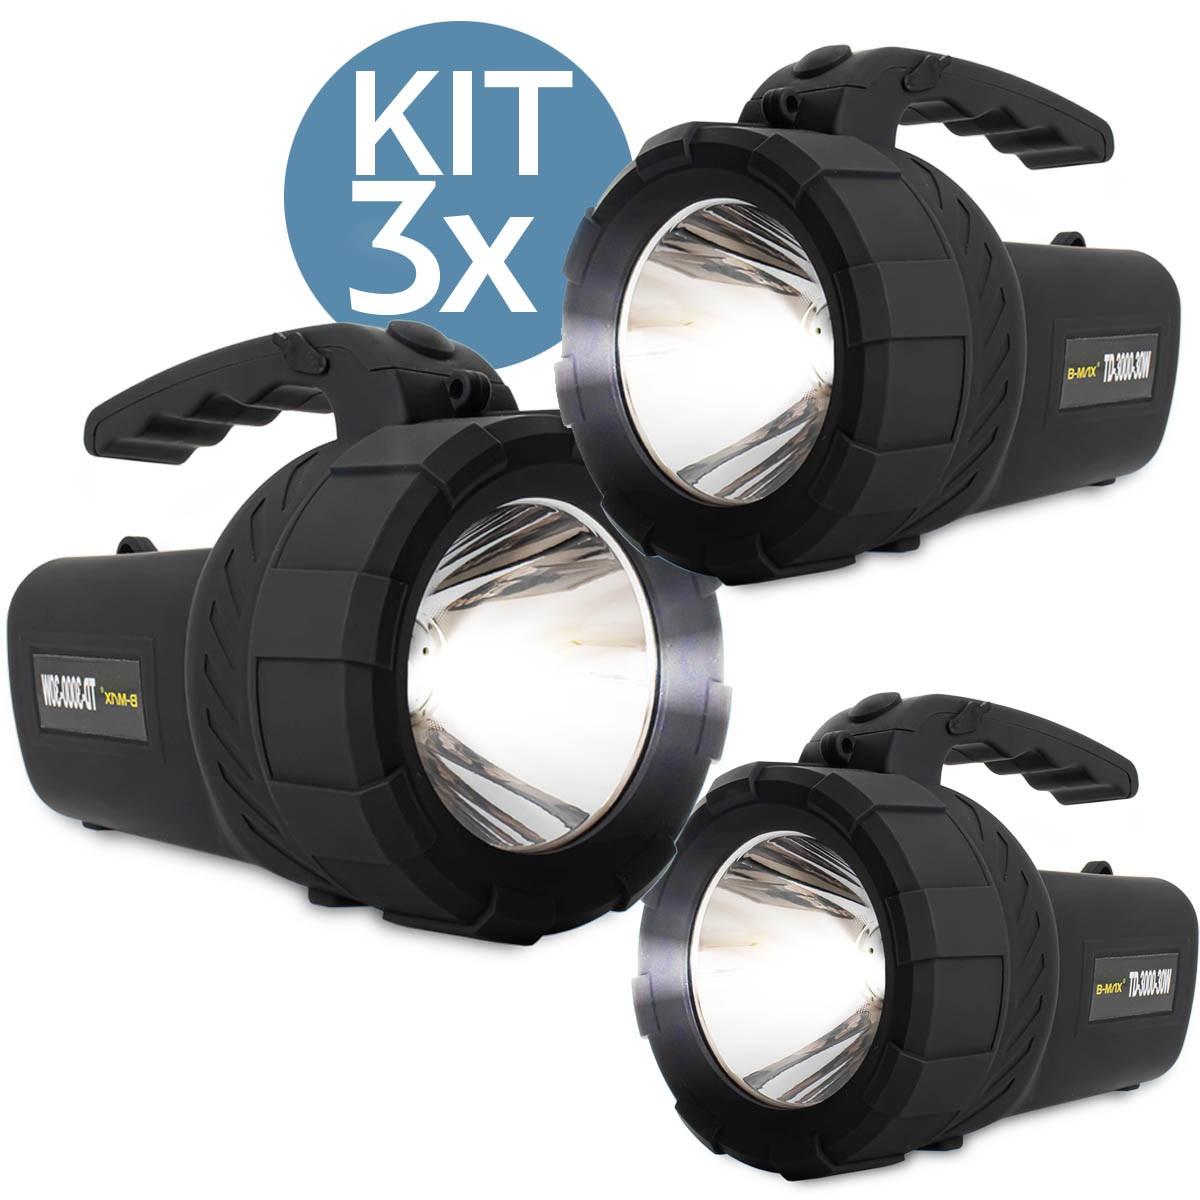 Kit 3x Lanterna Led Holofote Recarregável B-Max TD-3000-30W